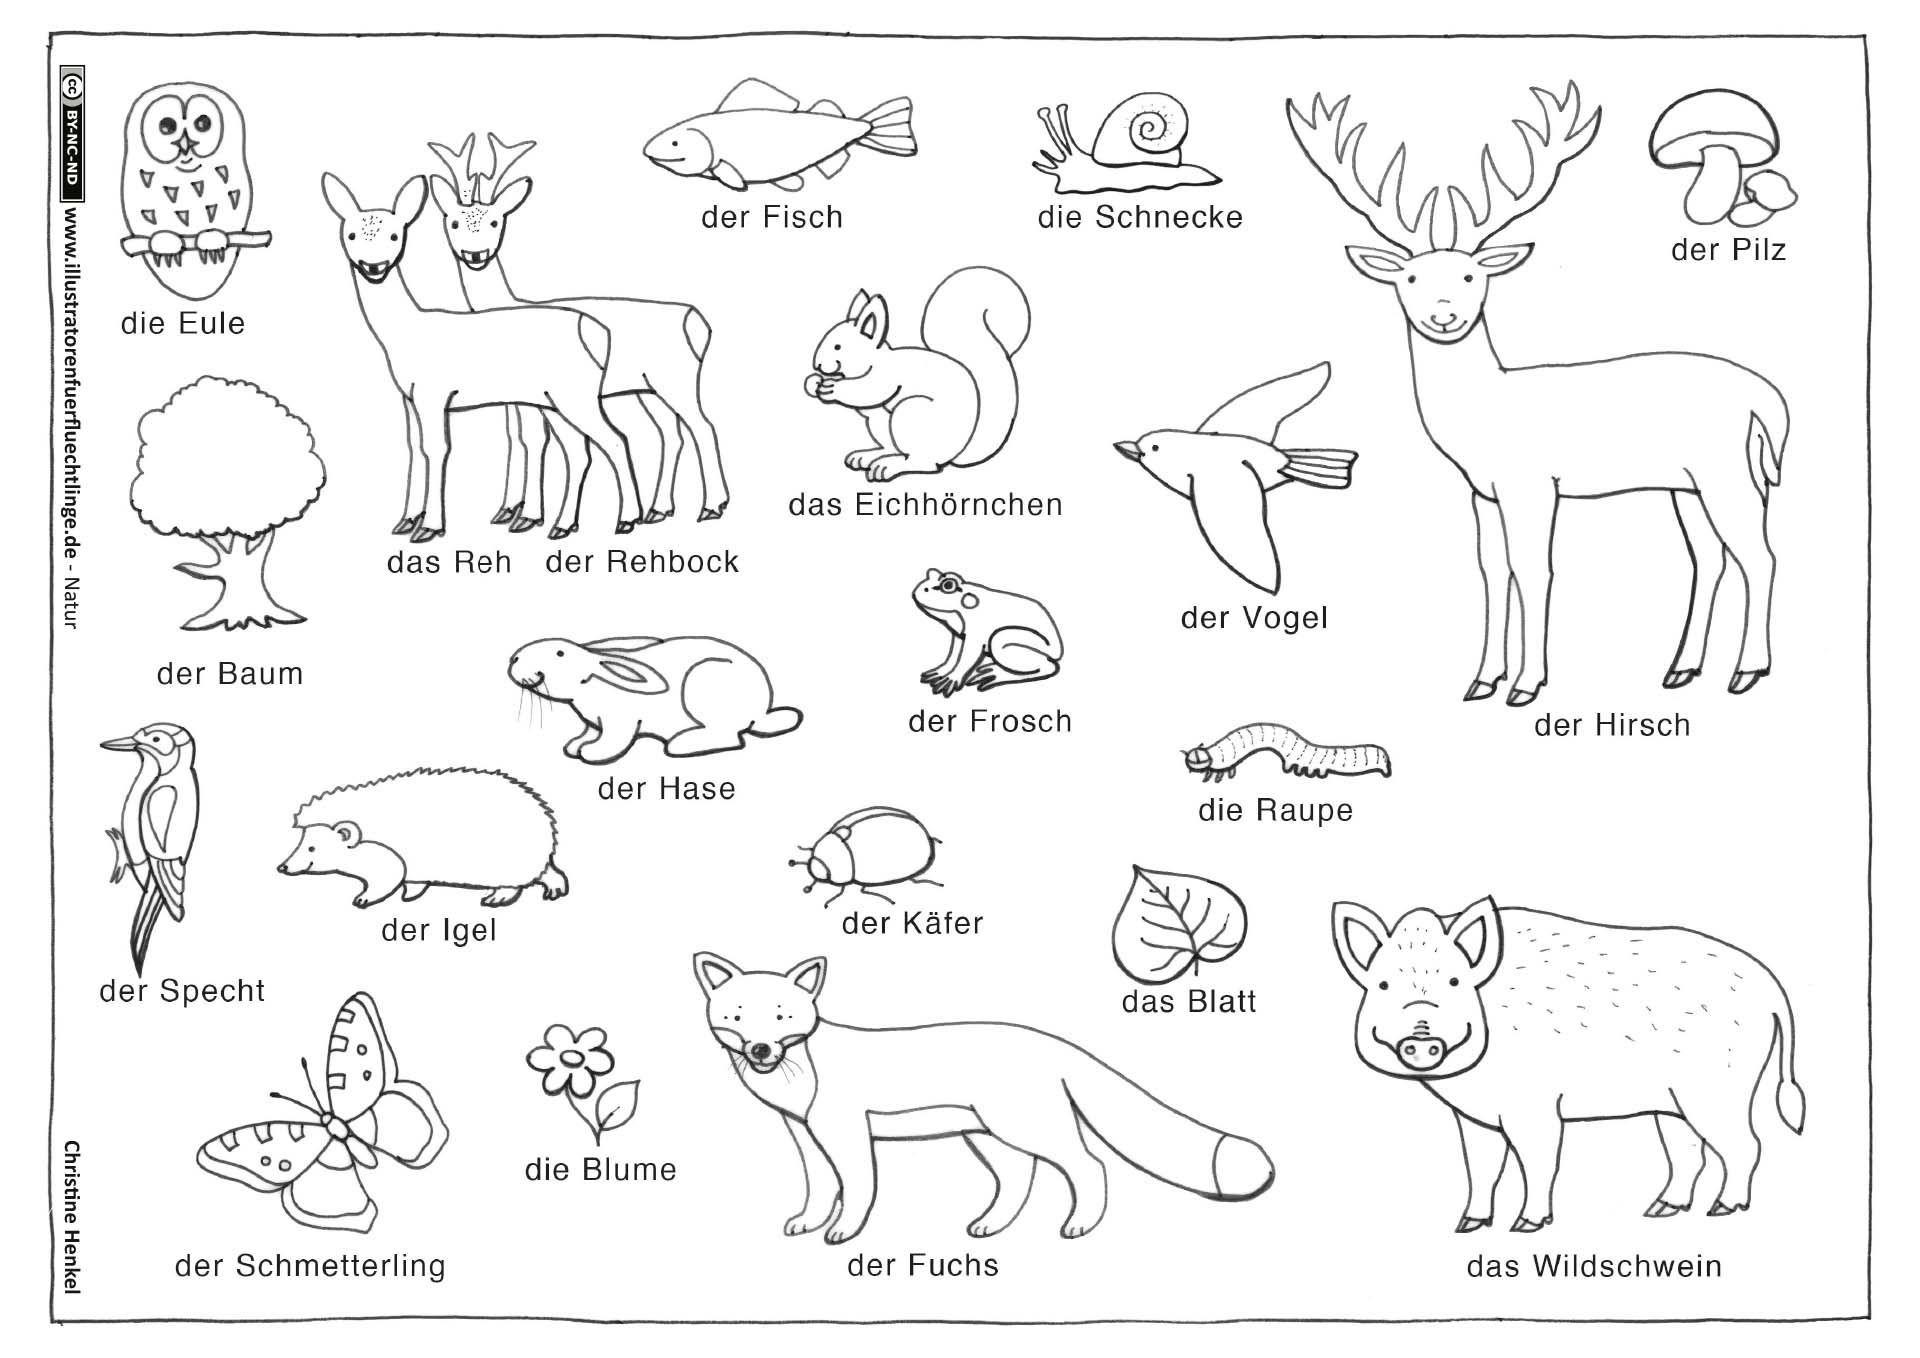 Download as PDF: Nature - Forest Animals Plants - Henkel#animals